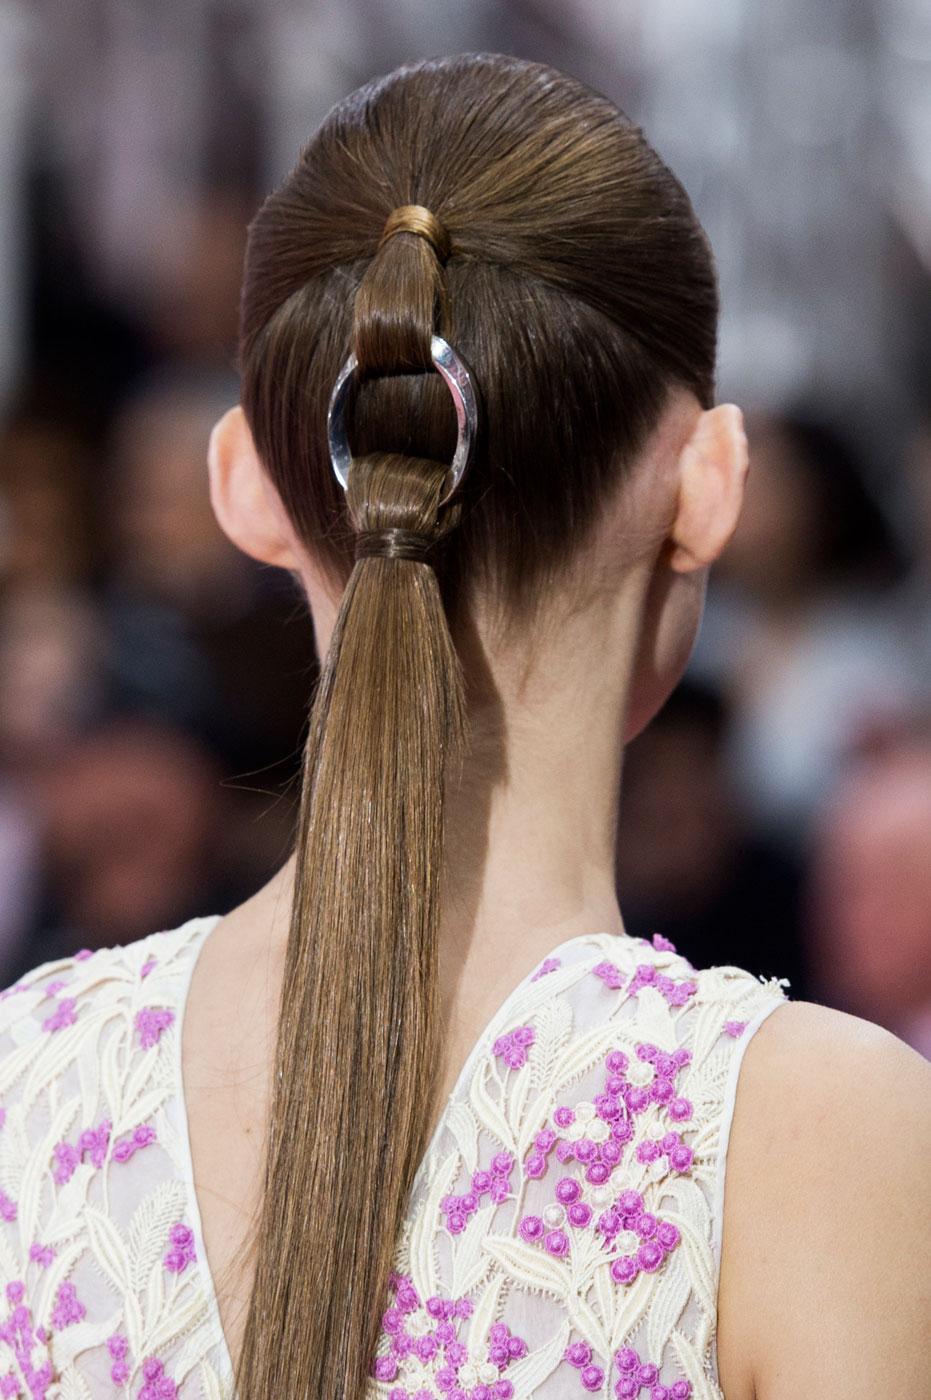 Christian-Dior-fashion-runway-show-close-ups-haute-couture-paris-spring-summer-2015-the-impression-189